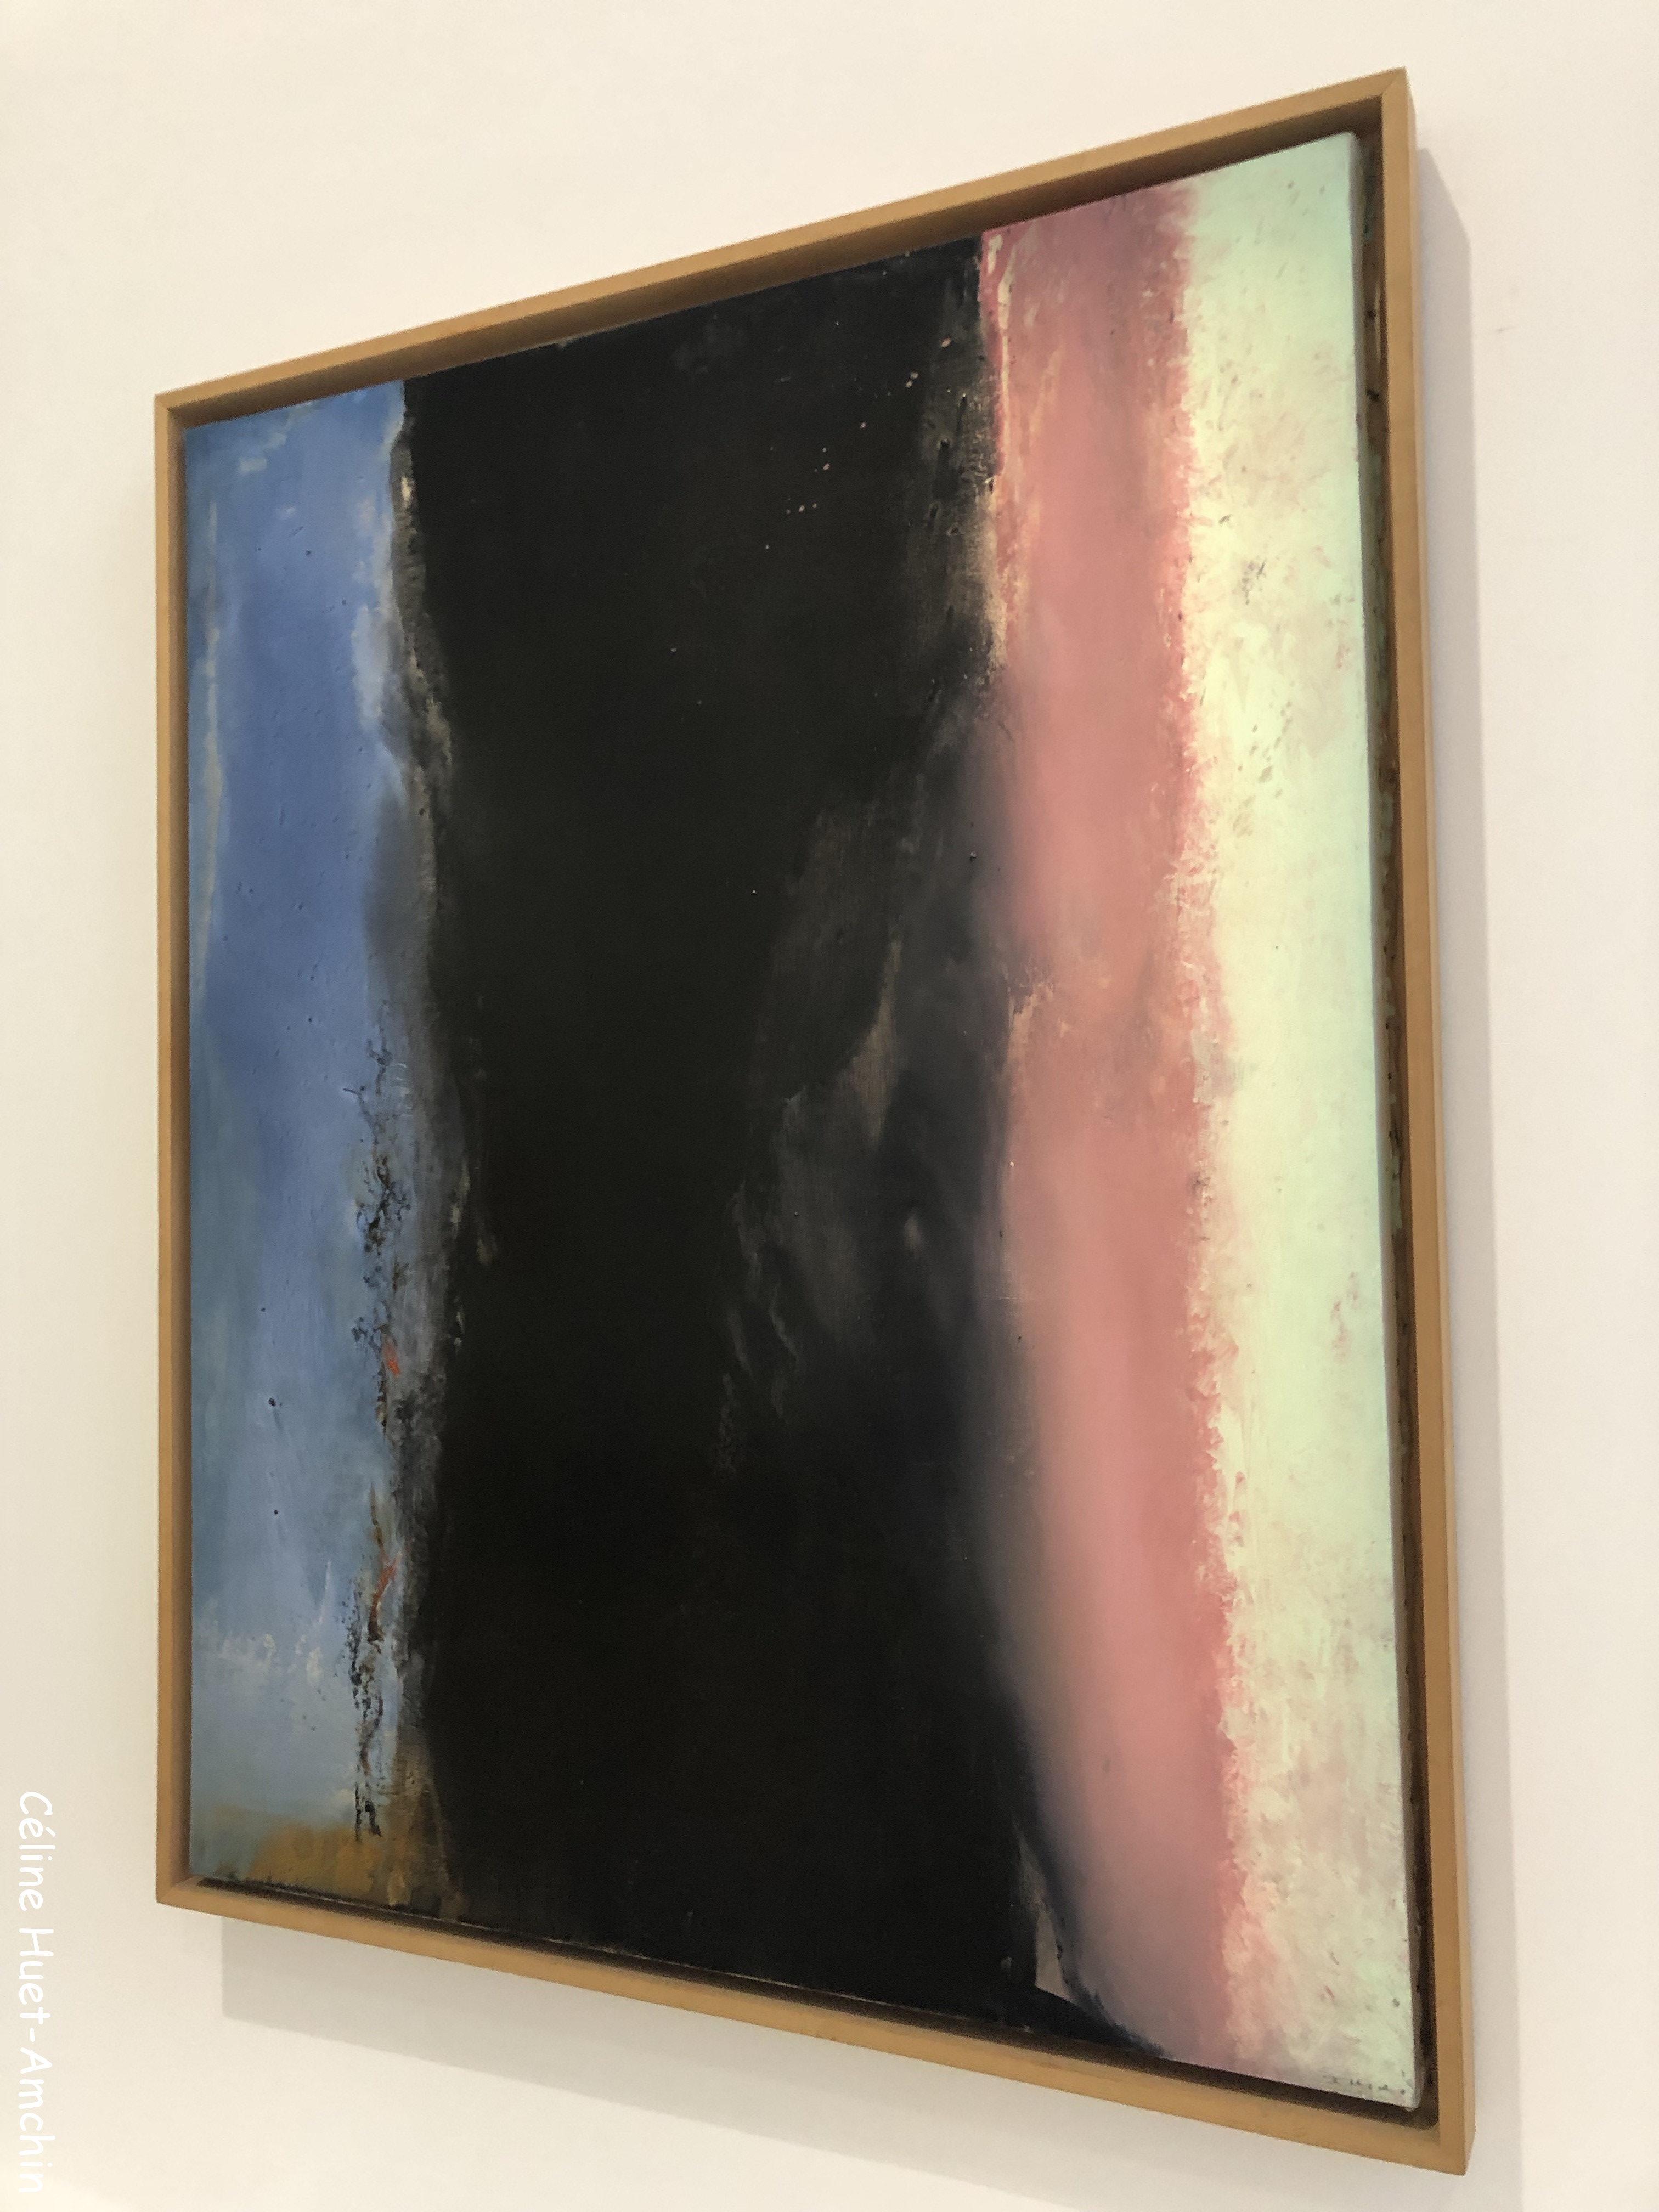 Hommage à Henri Matisse 1986 Zao Wou-Ki L'espace est silence MAM Paris